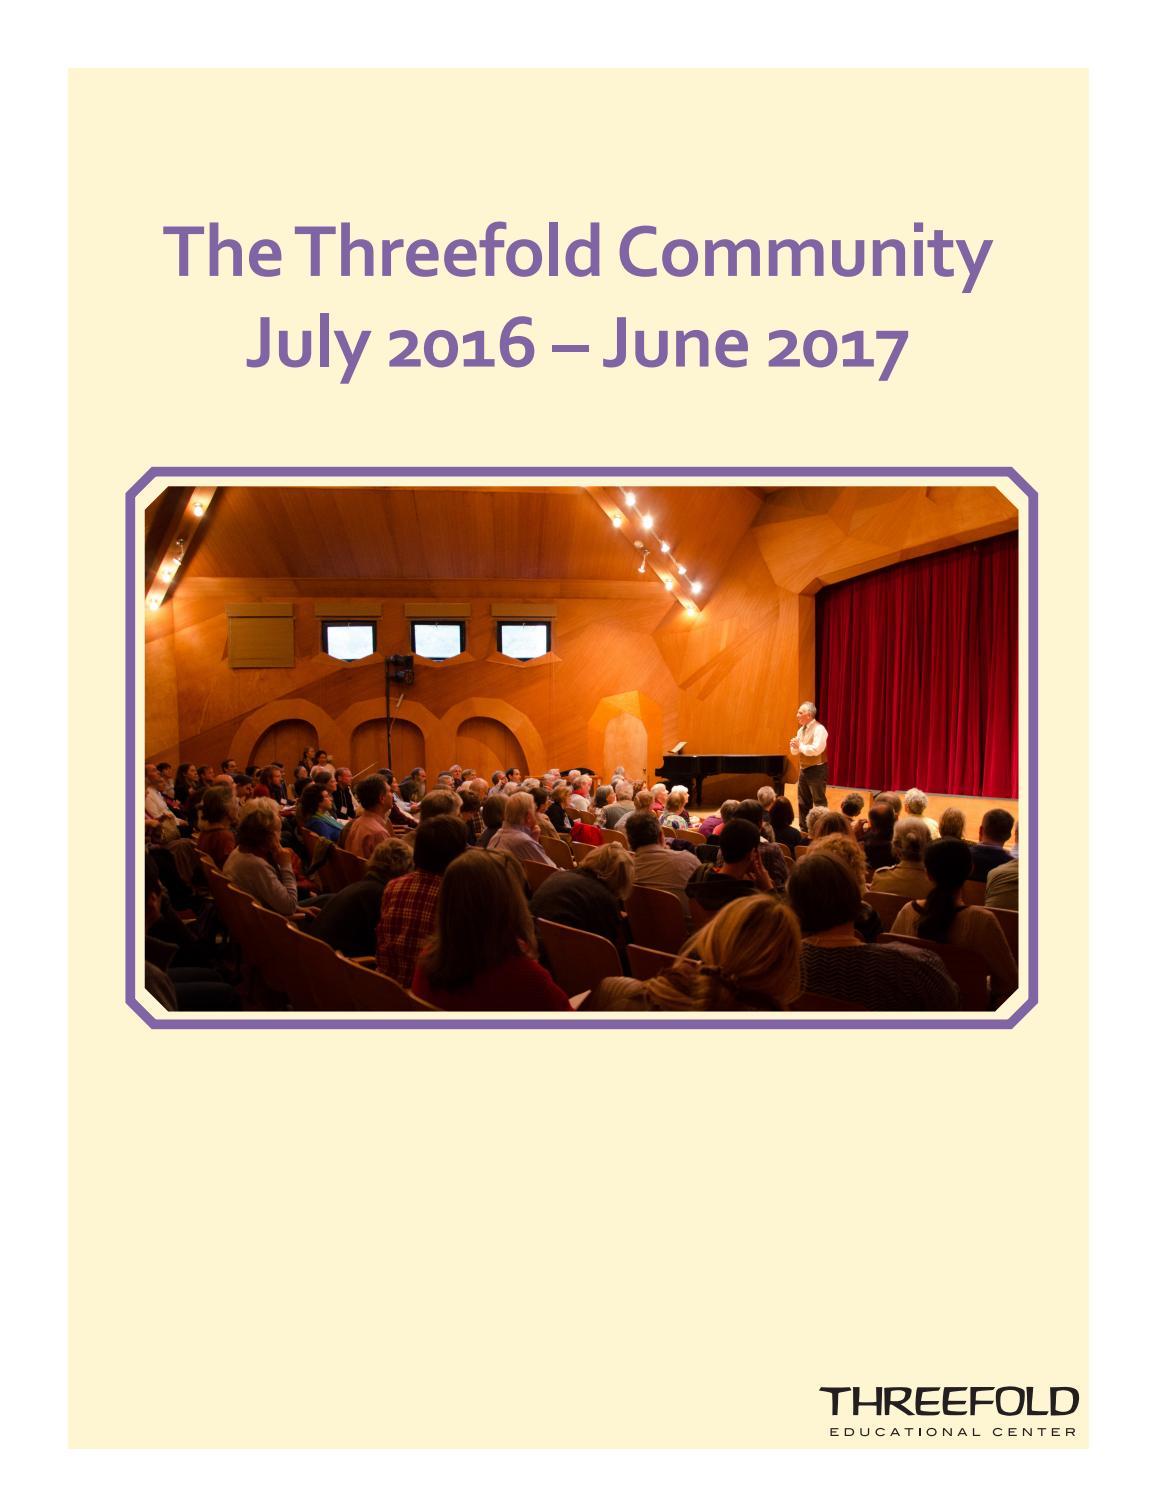 Threefold community 2016-17 by Michael William Sweeney - issuu